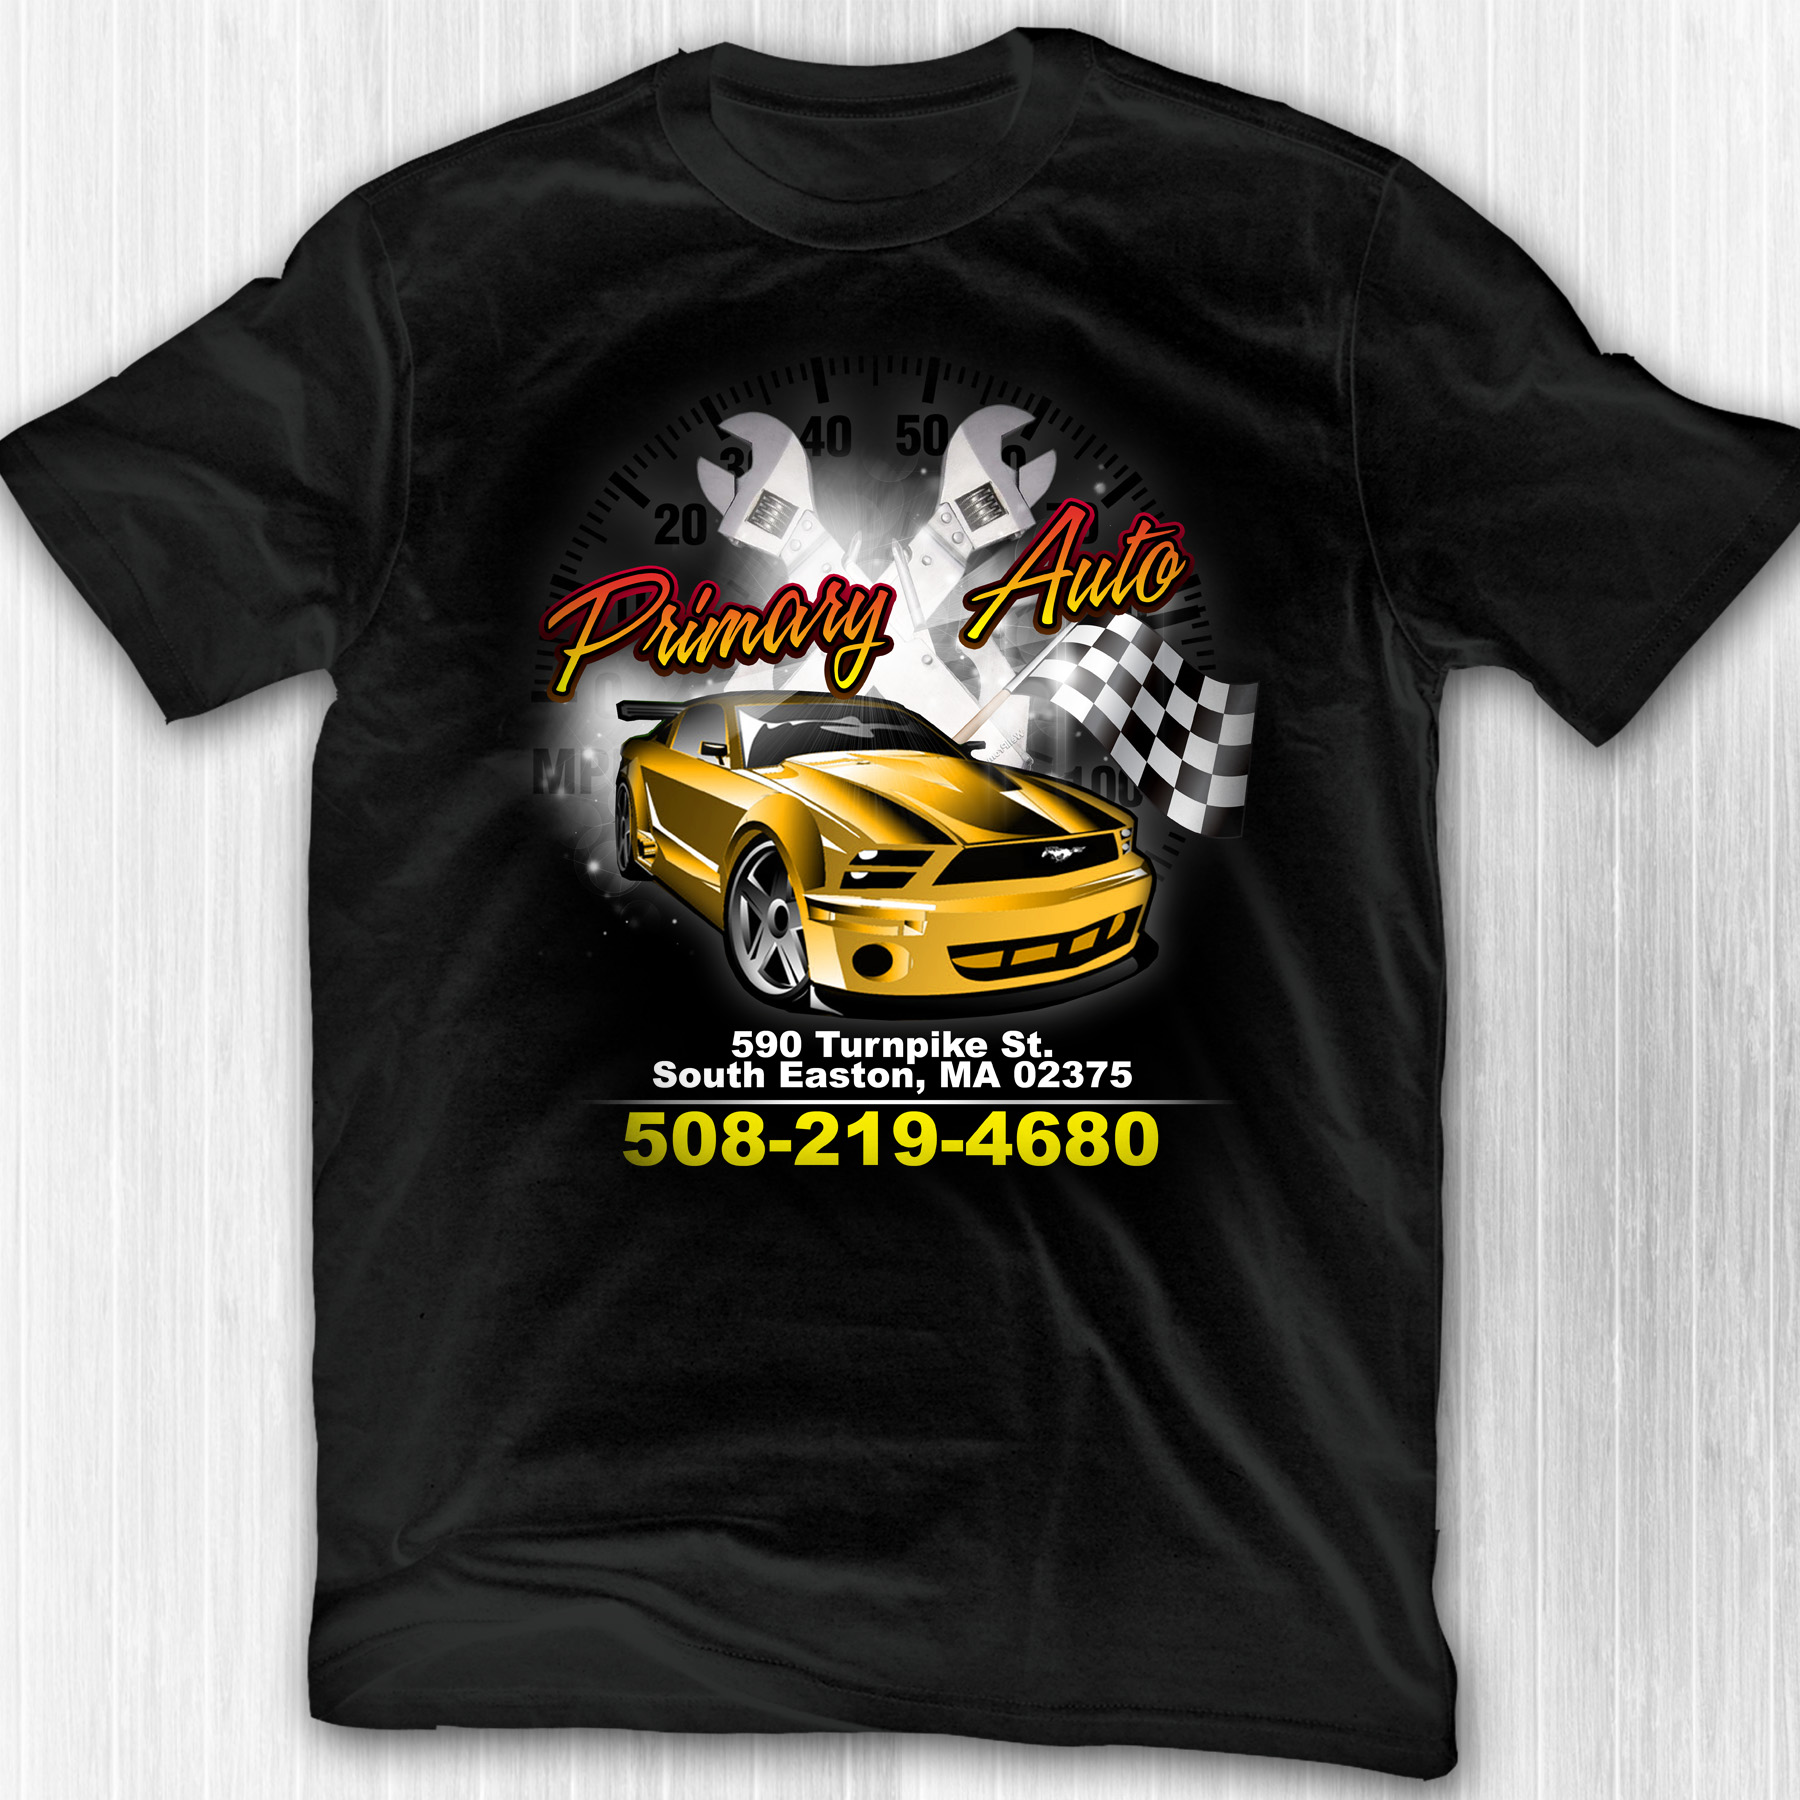 Primary Auto shirt